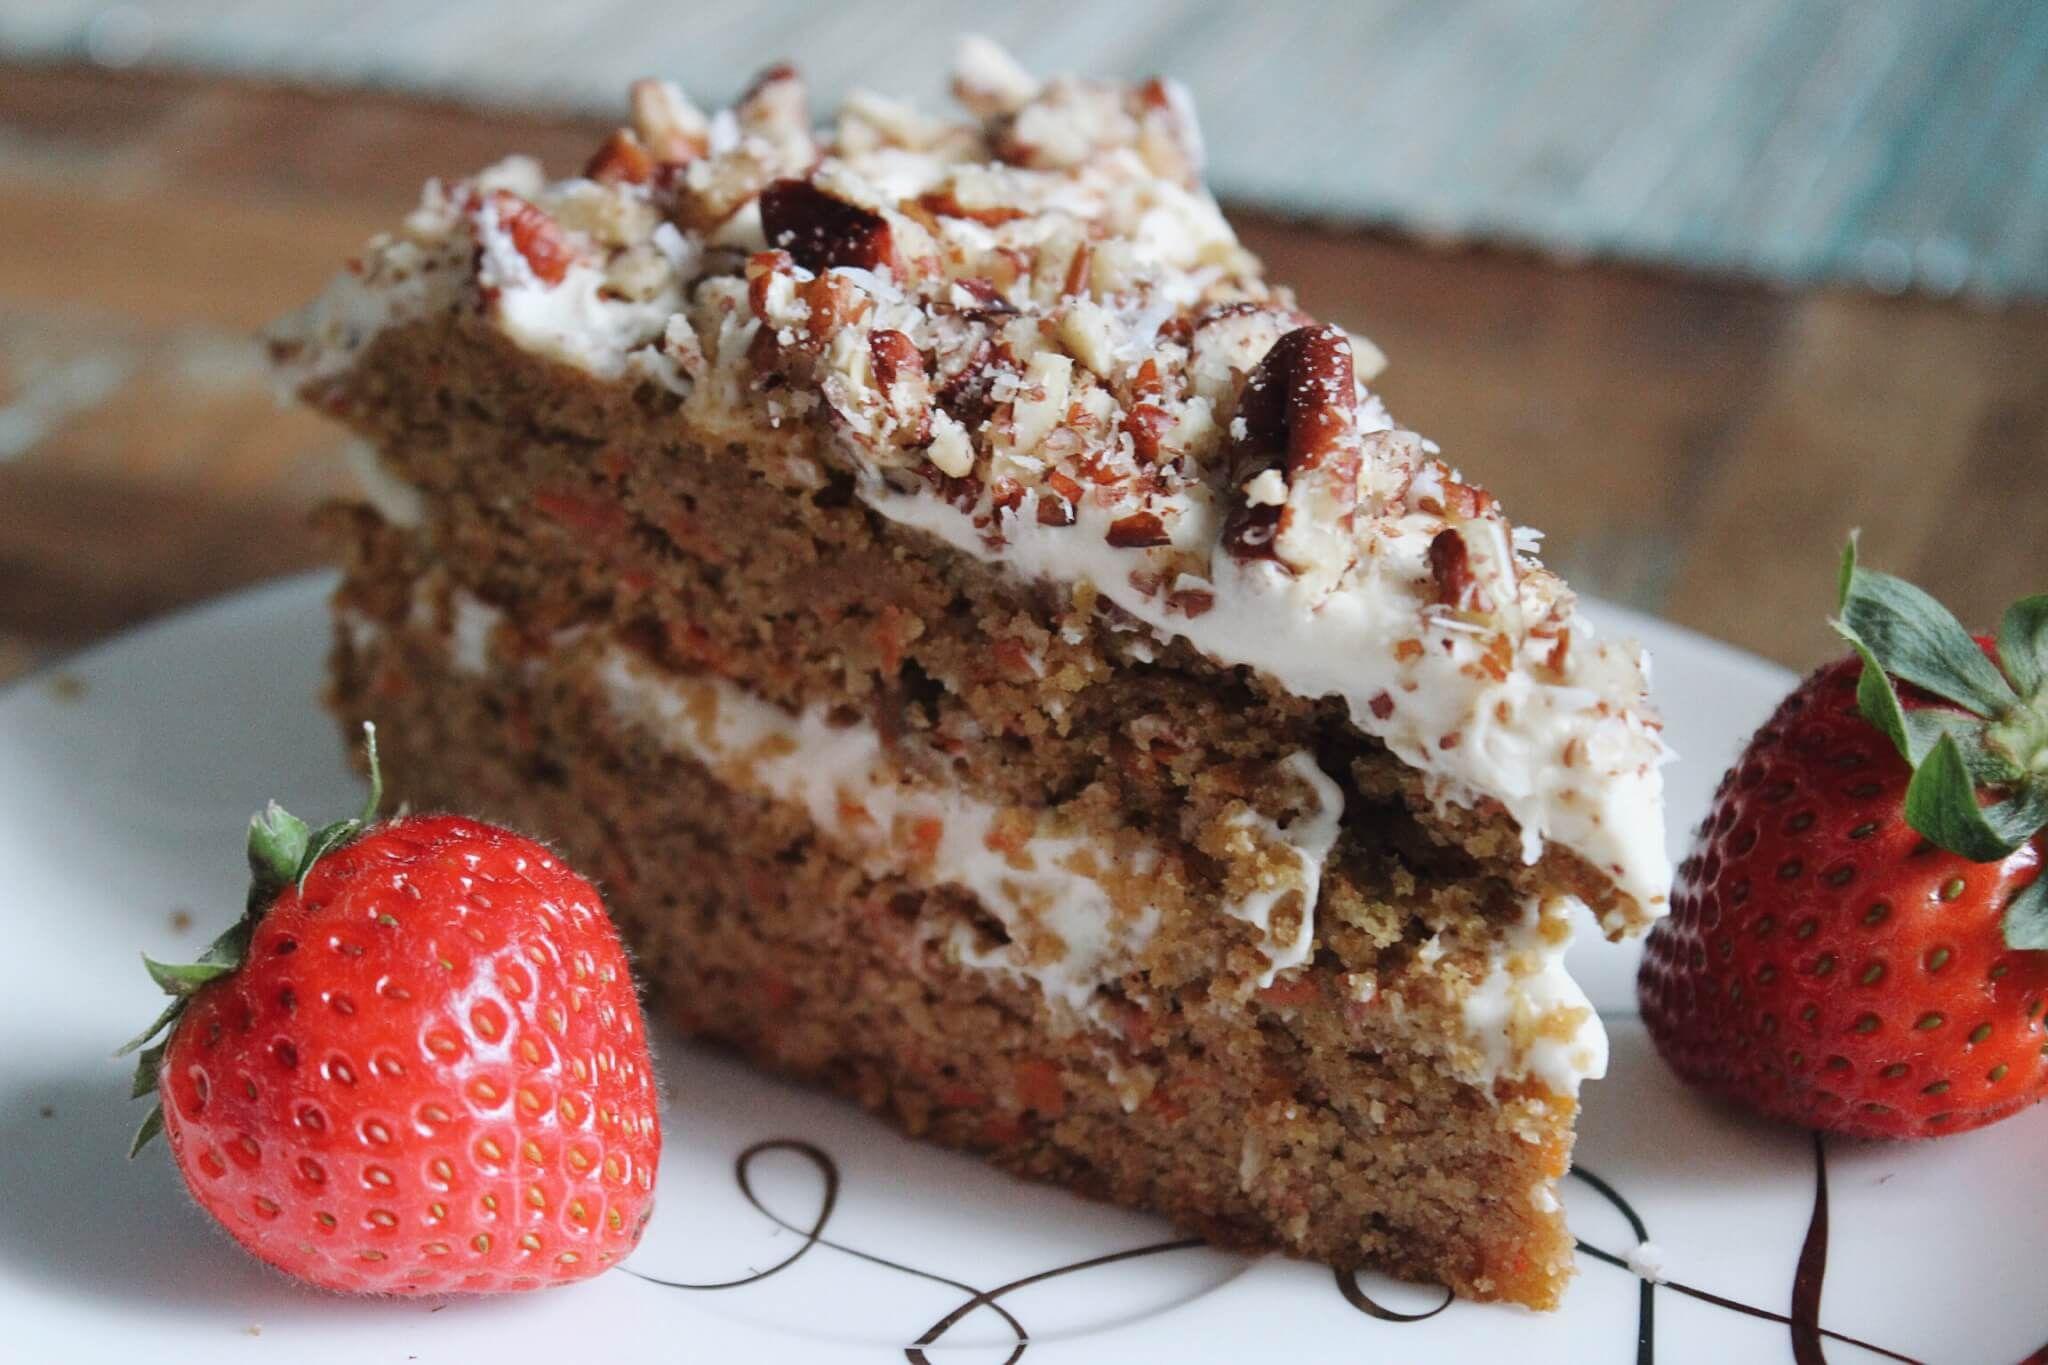 Keto Diet Carrot Cake Recipe: Fat Burning Keto Carrot Cake Recipe